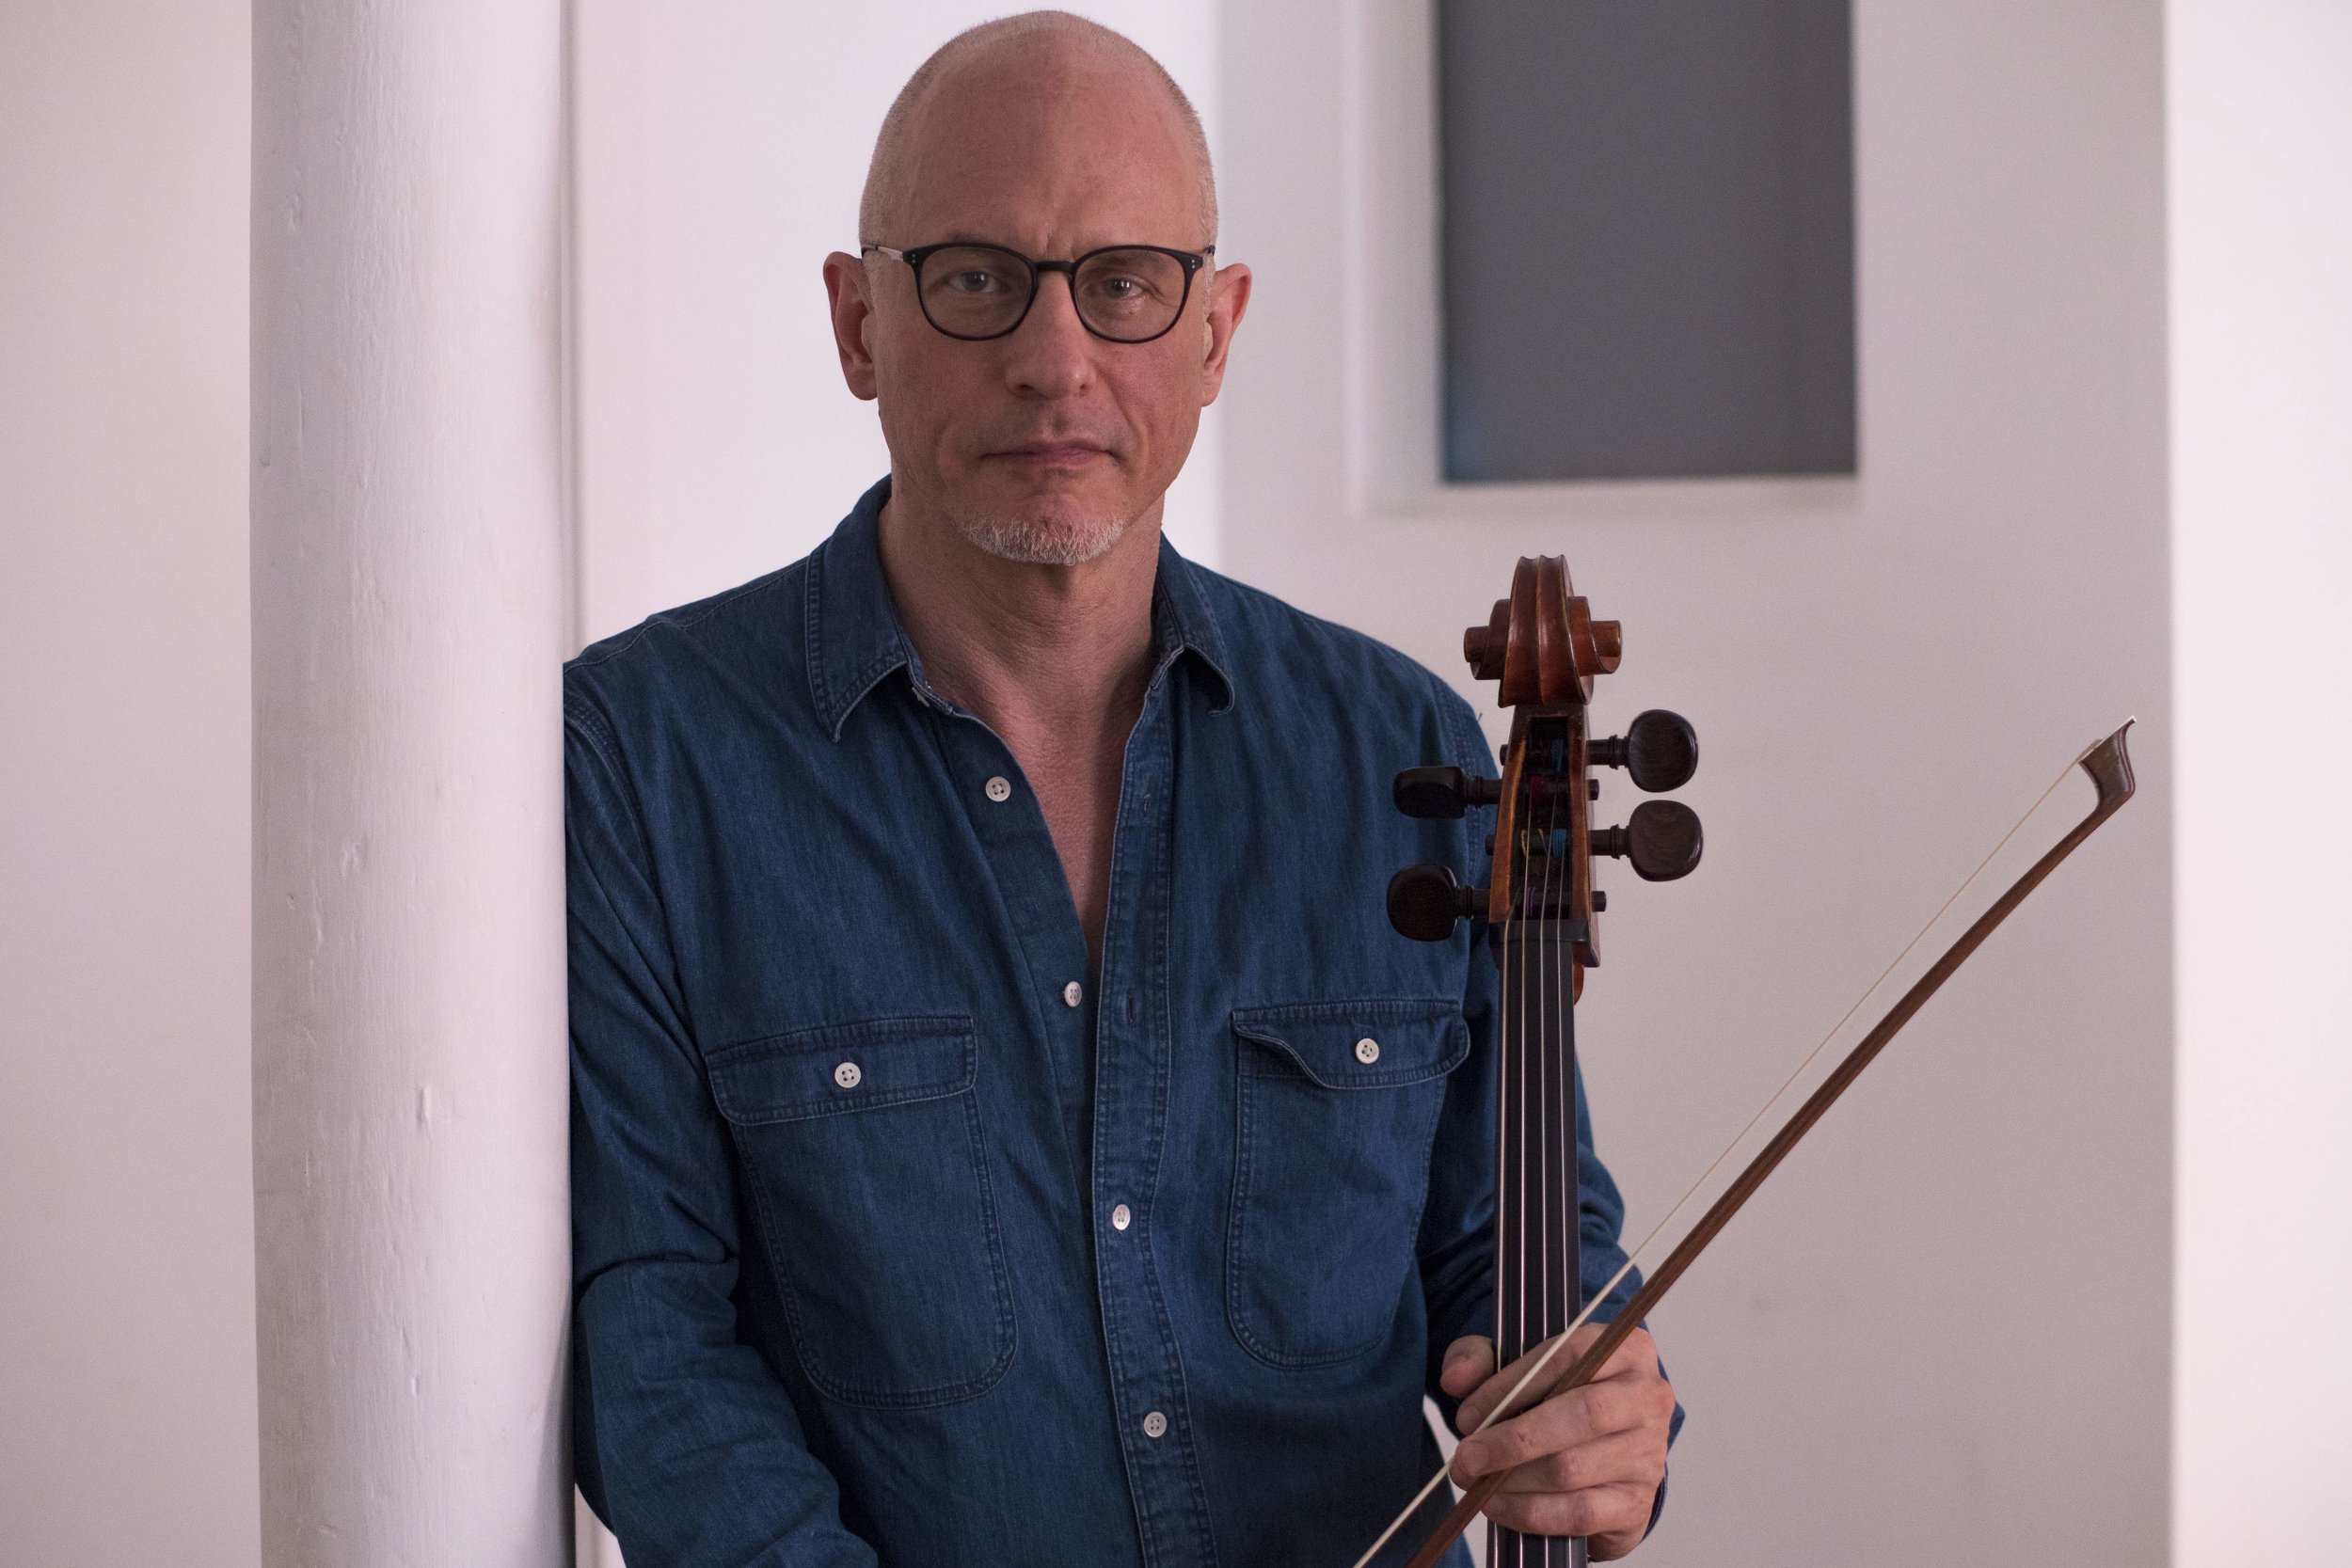 Erik Friedlander (photo by Peter Peregrine)